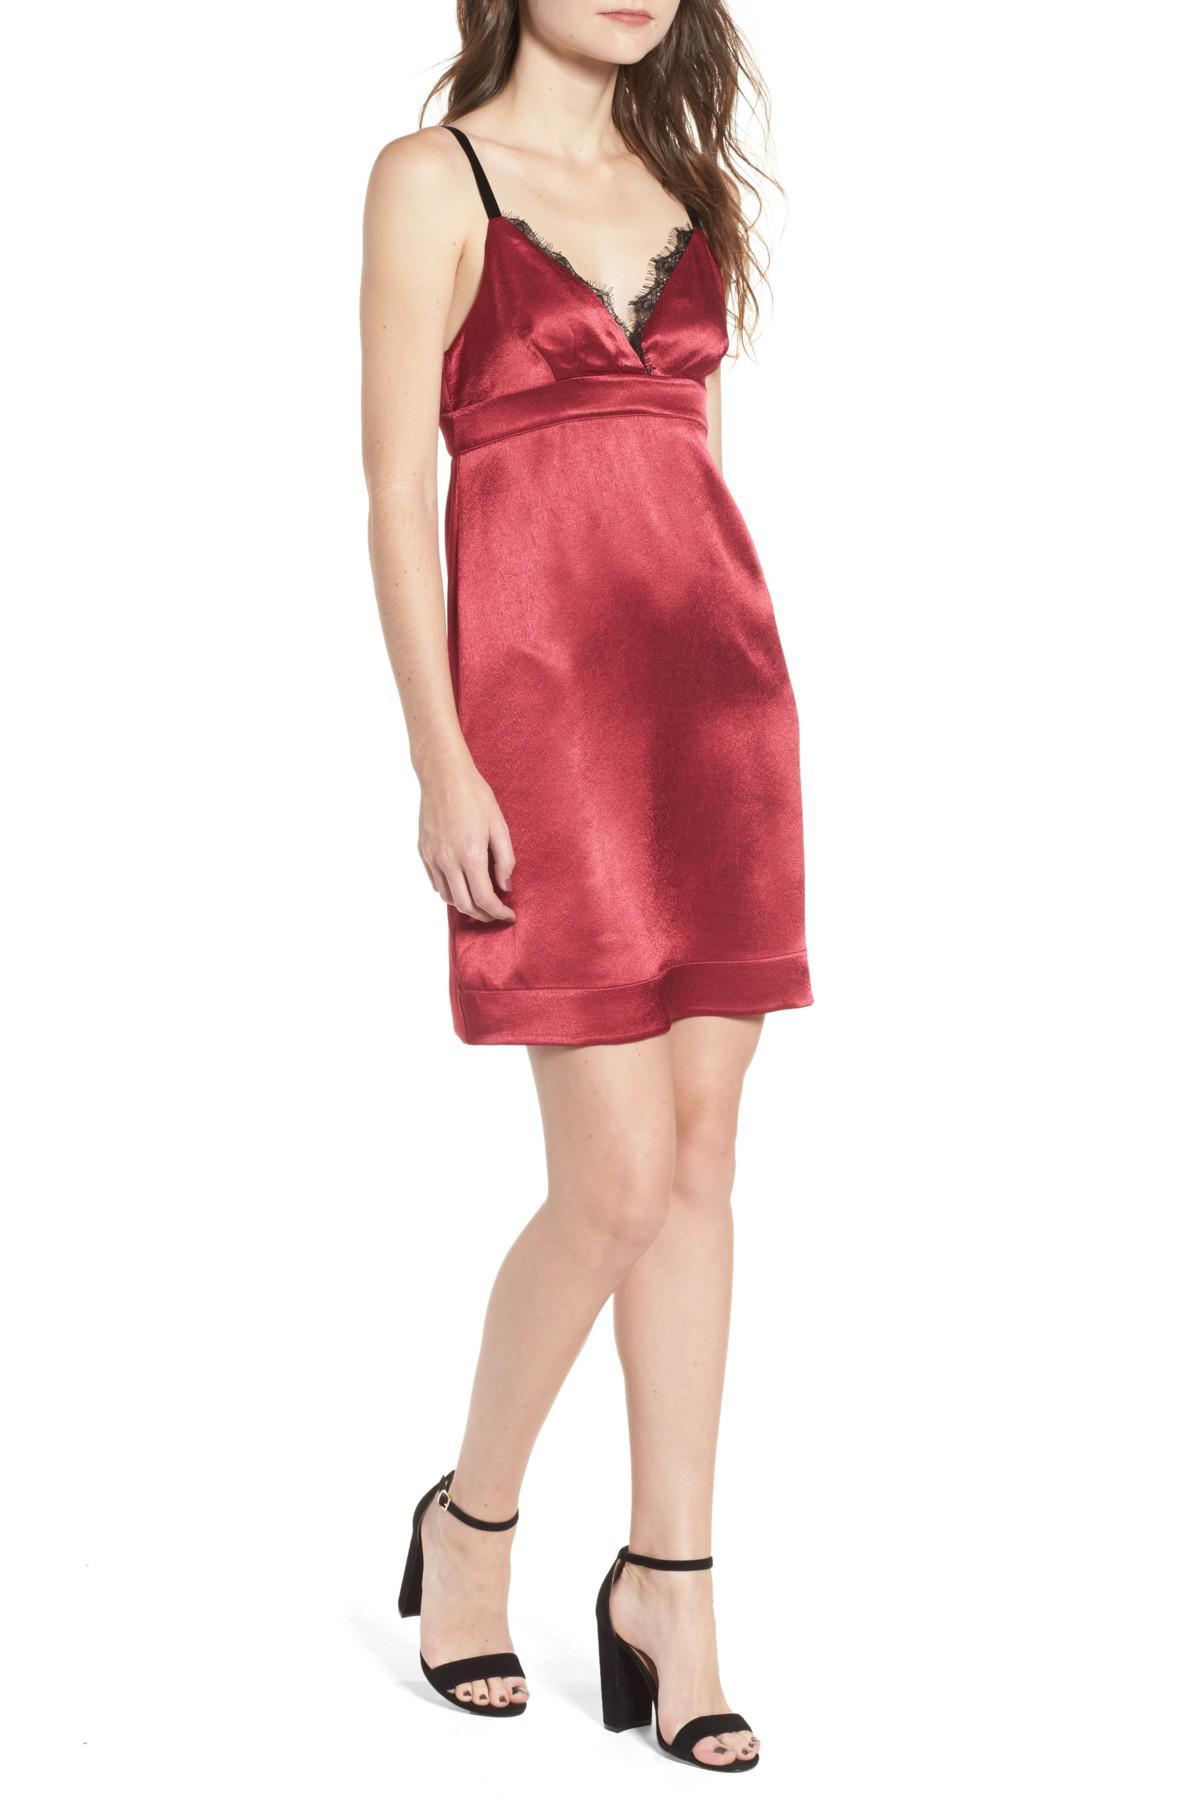 Lyst - Ella Moss Mini Party Slipdres in Red 4f3aab5ba